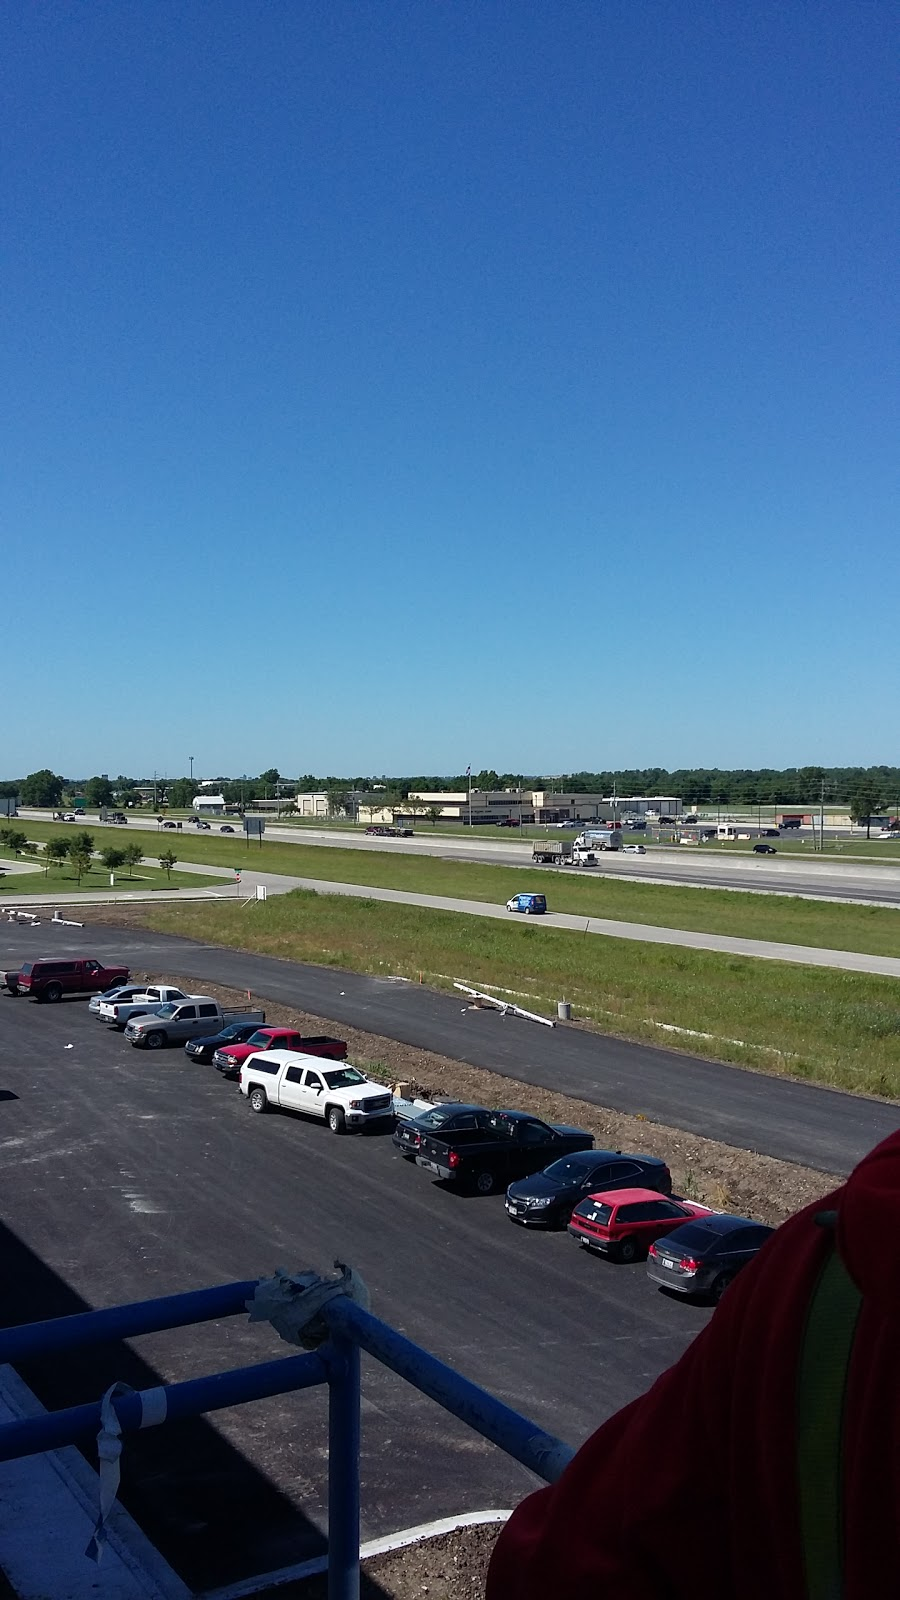 American Tire Distributors - car repair  | Photo 4 of 6 | Address: 4223 N Garnett Rd, Tulsa, OK 74116, USA | Phone: (918) 877-4332